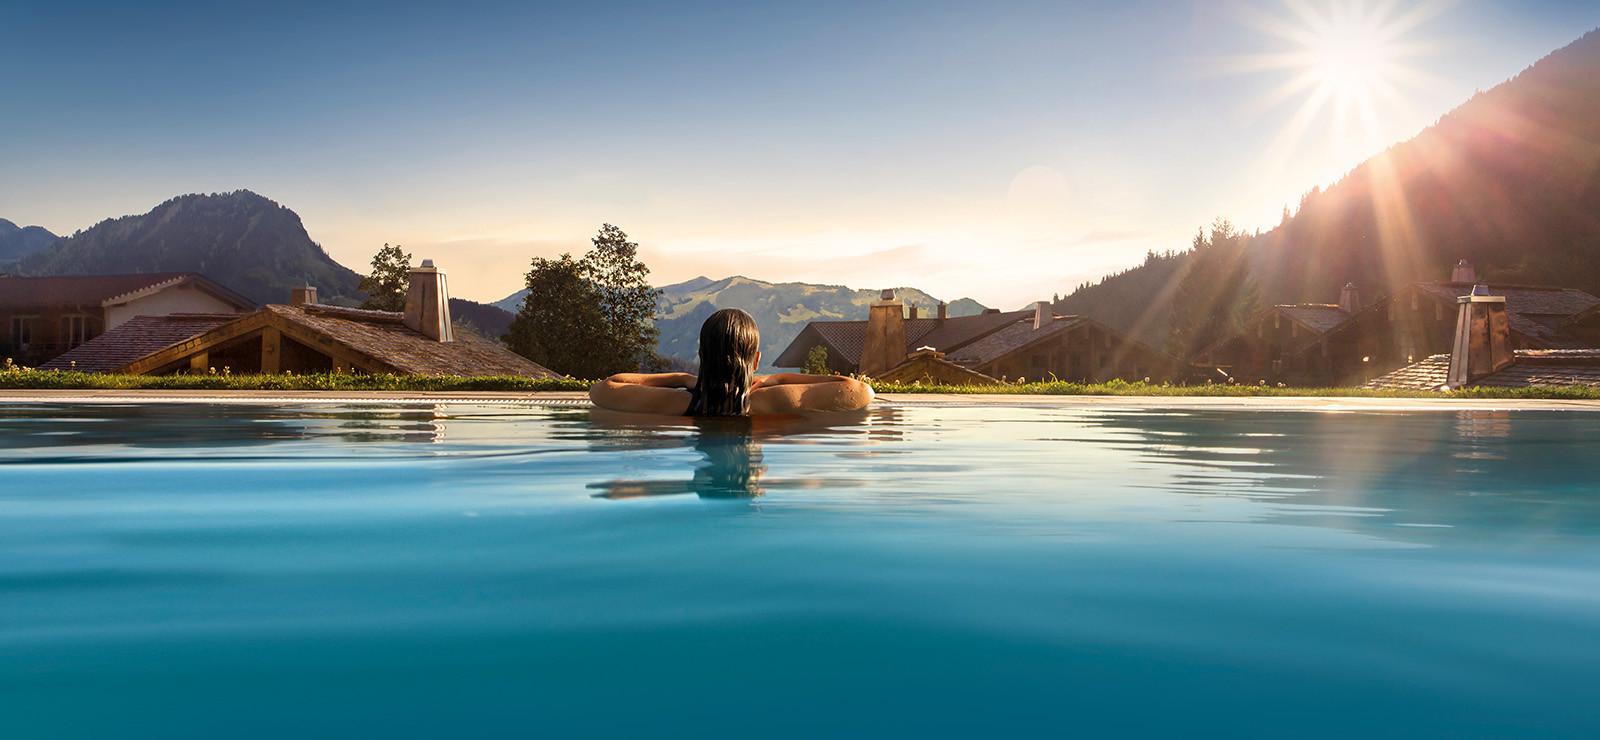 Panoramahotel Oberjoch Bilder | Bild 1